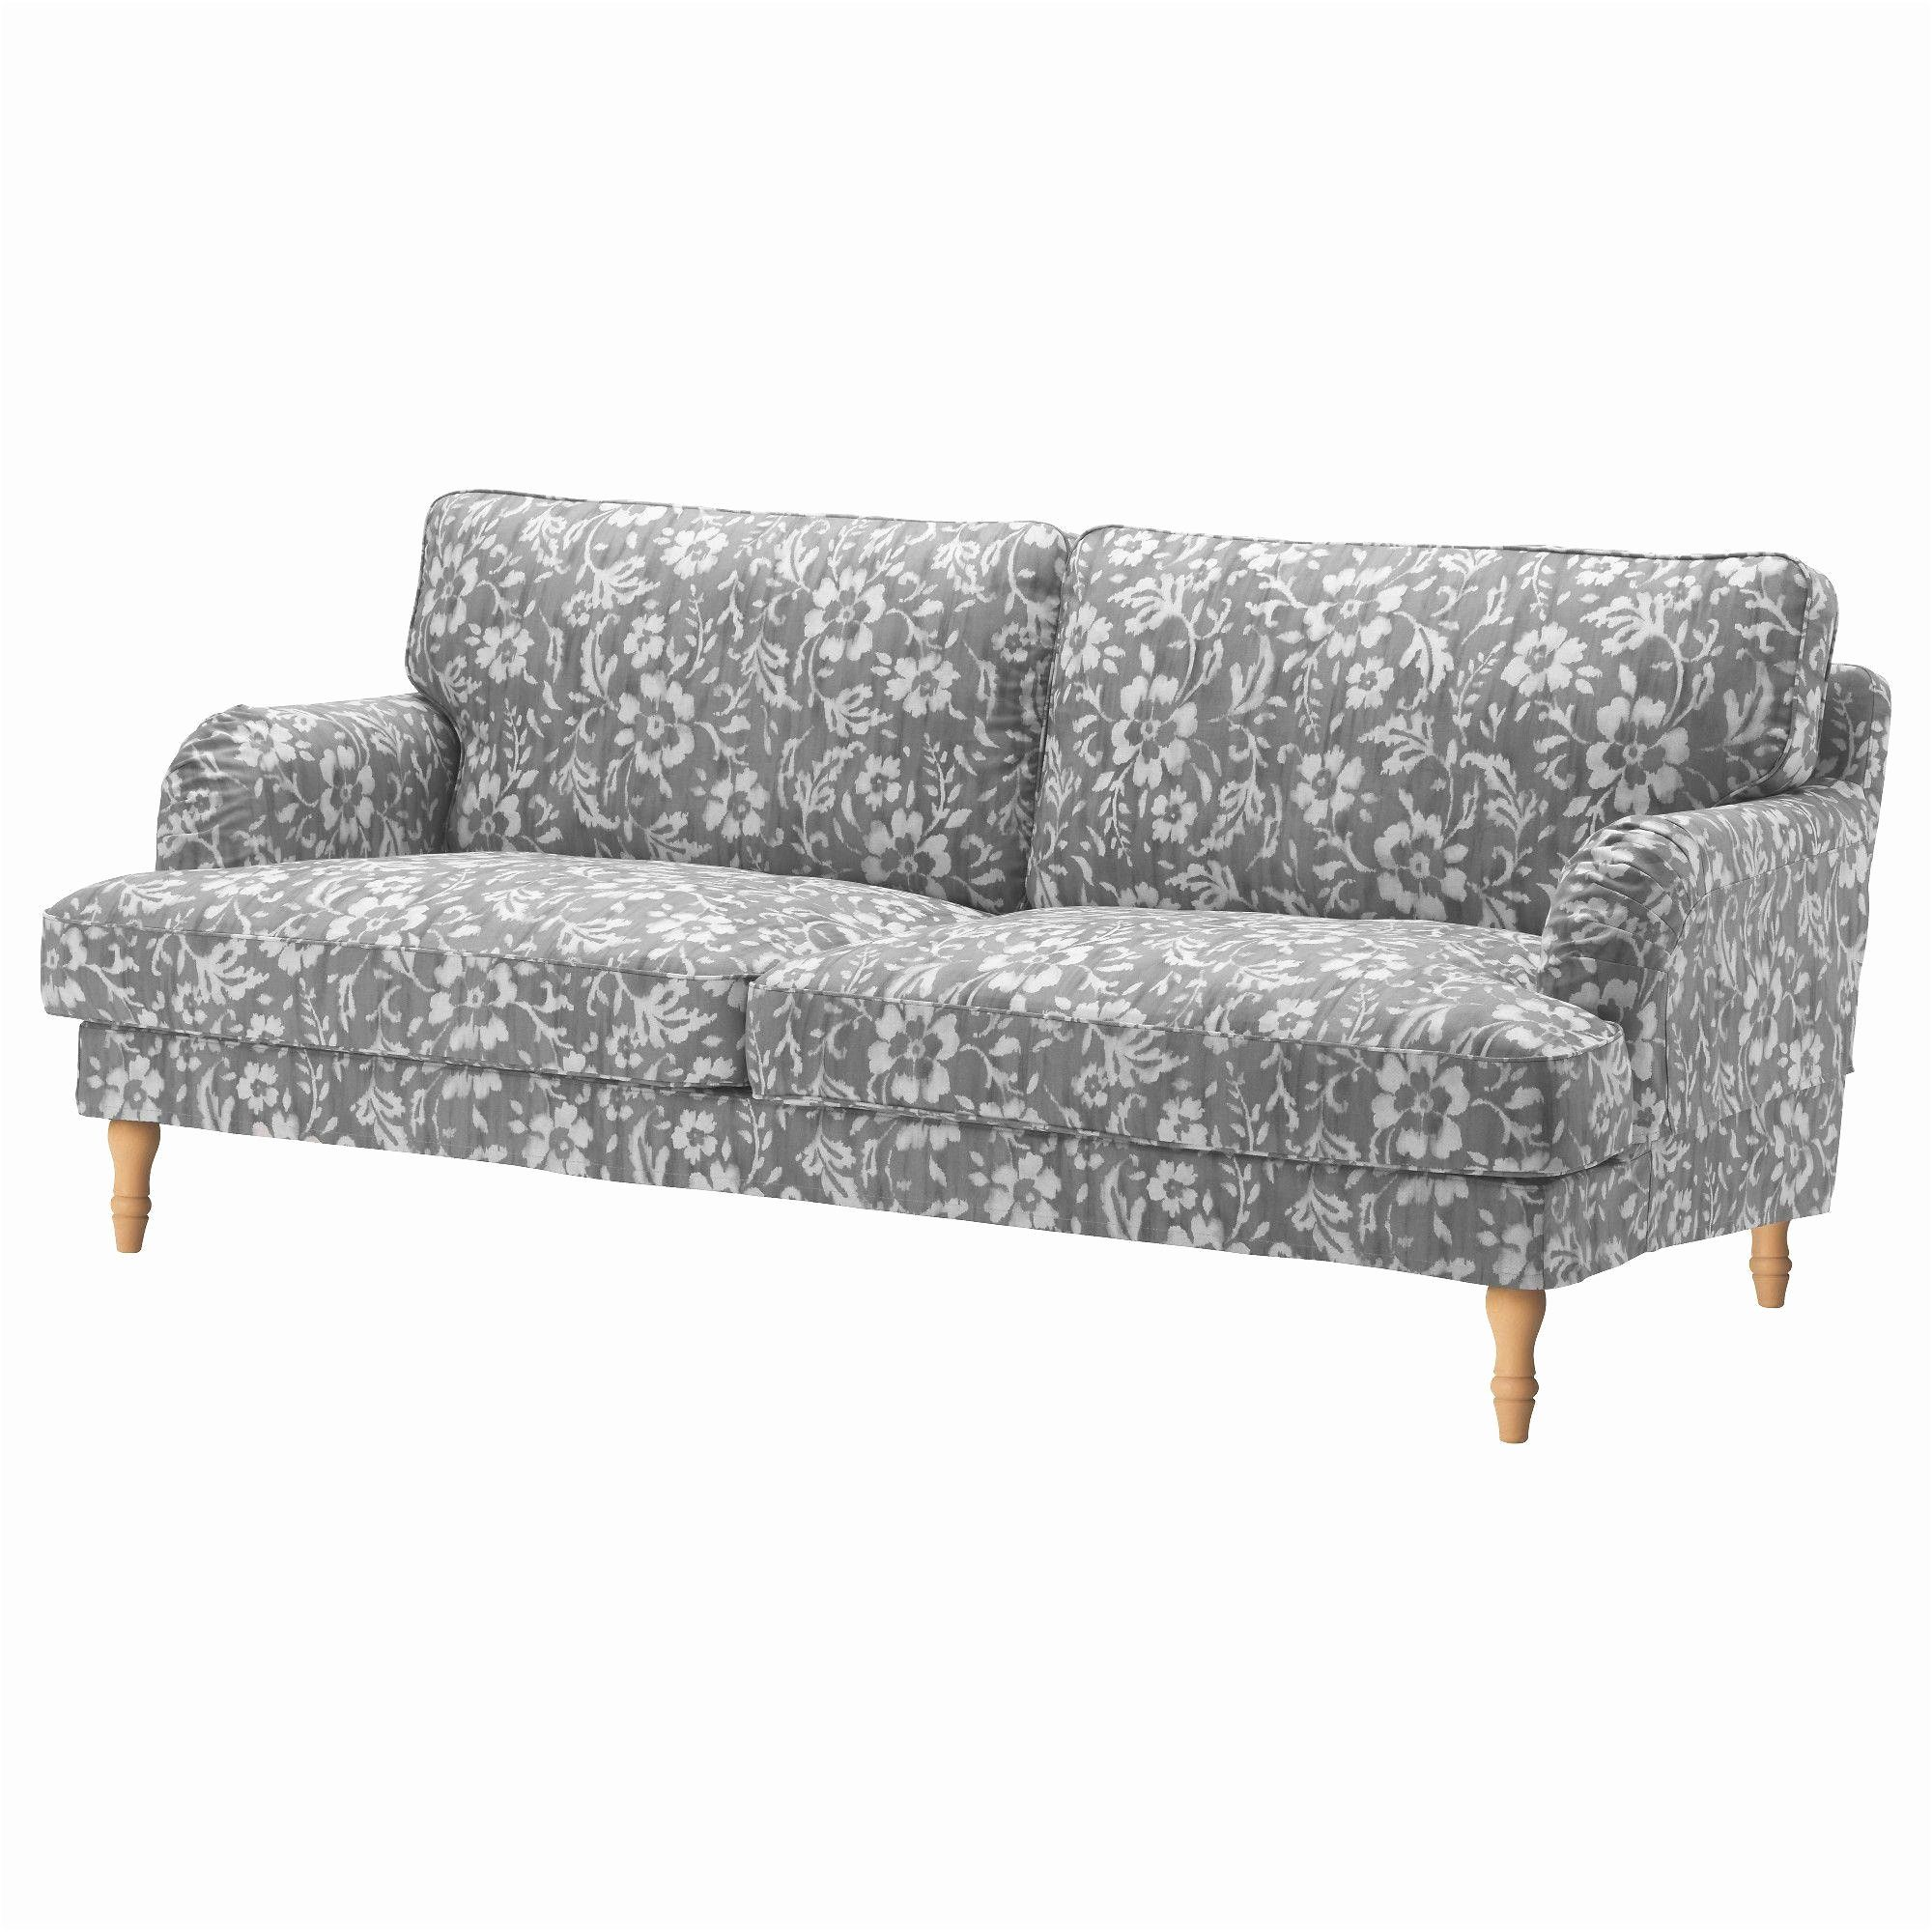 Prachtig Sofa 3 Sitzer Mit Schlaffunktion Ikea Sofa Ikea Stocksund Fabric Sofa